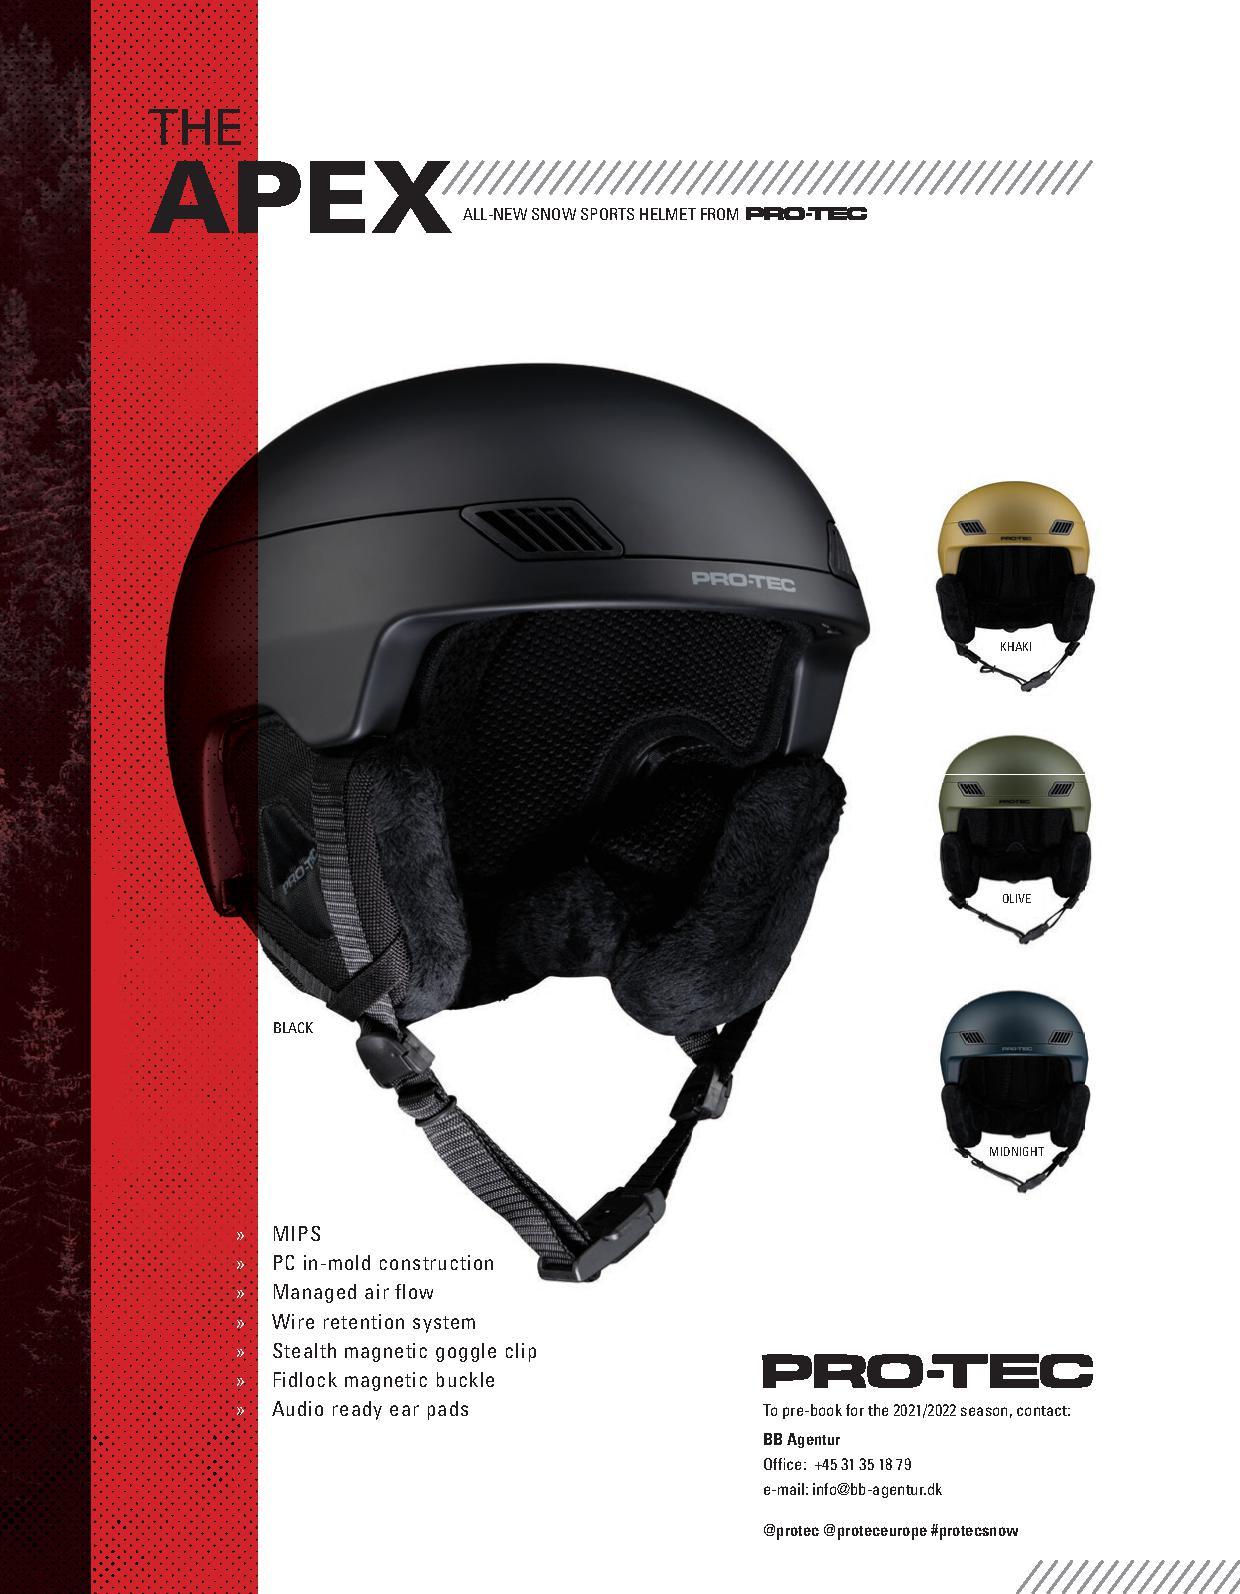 104 Protec snow helmets